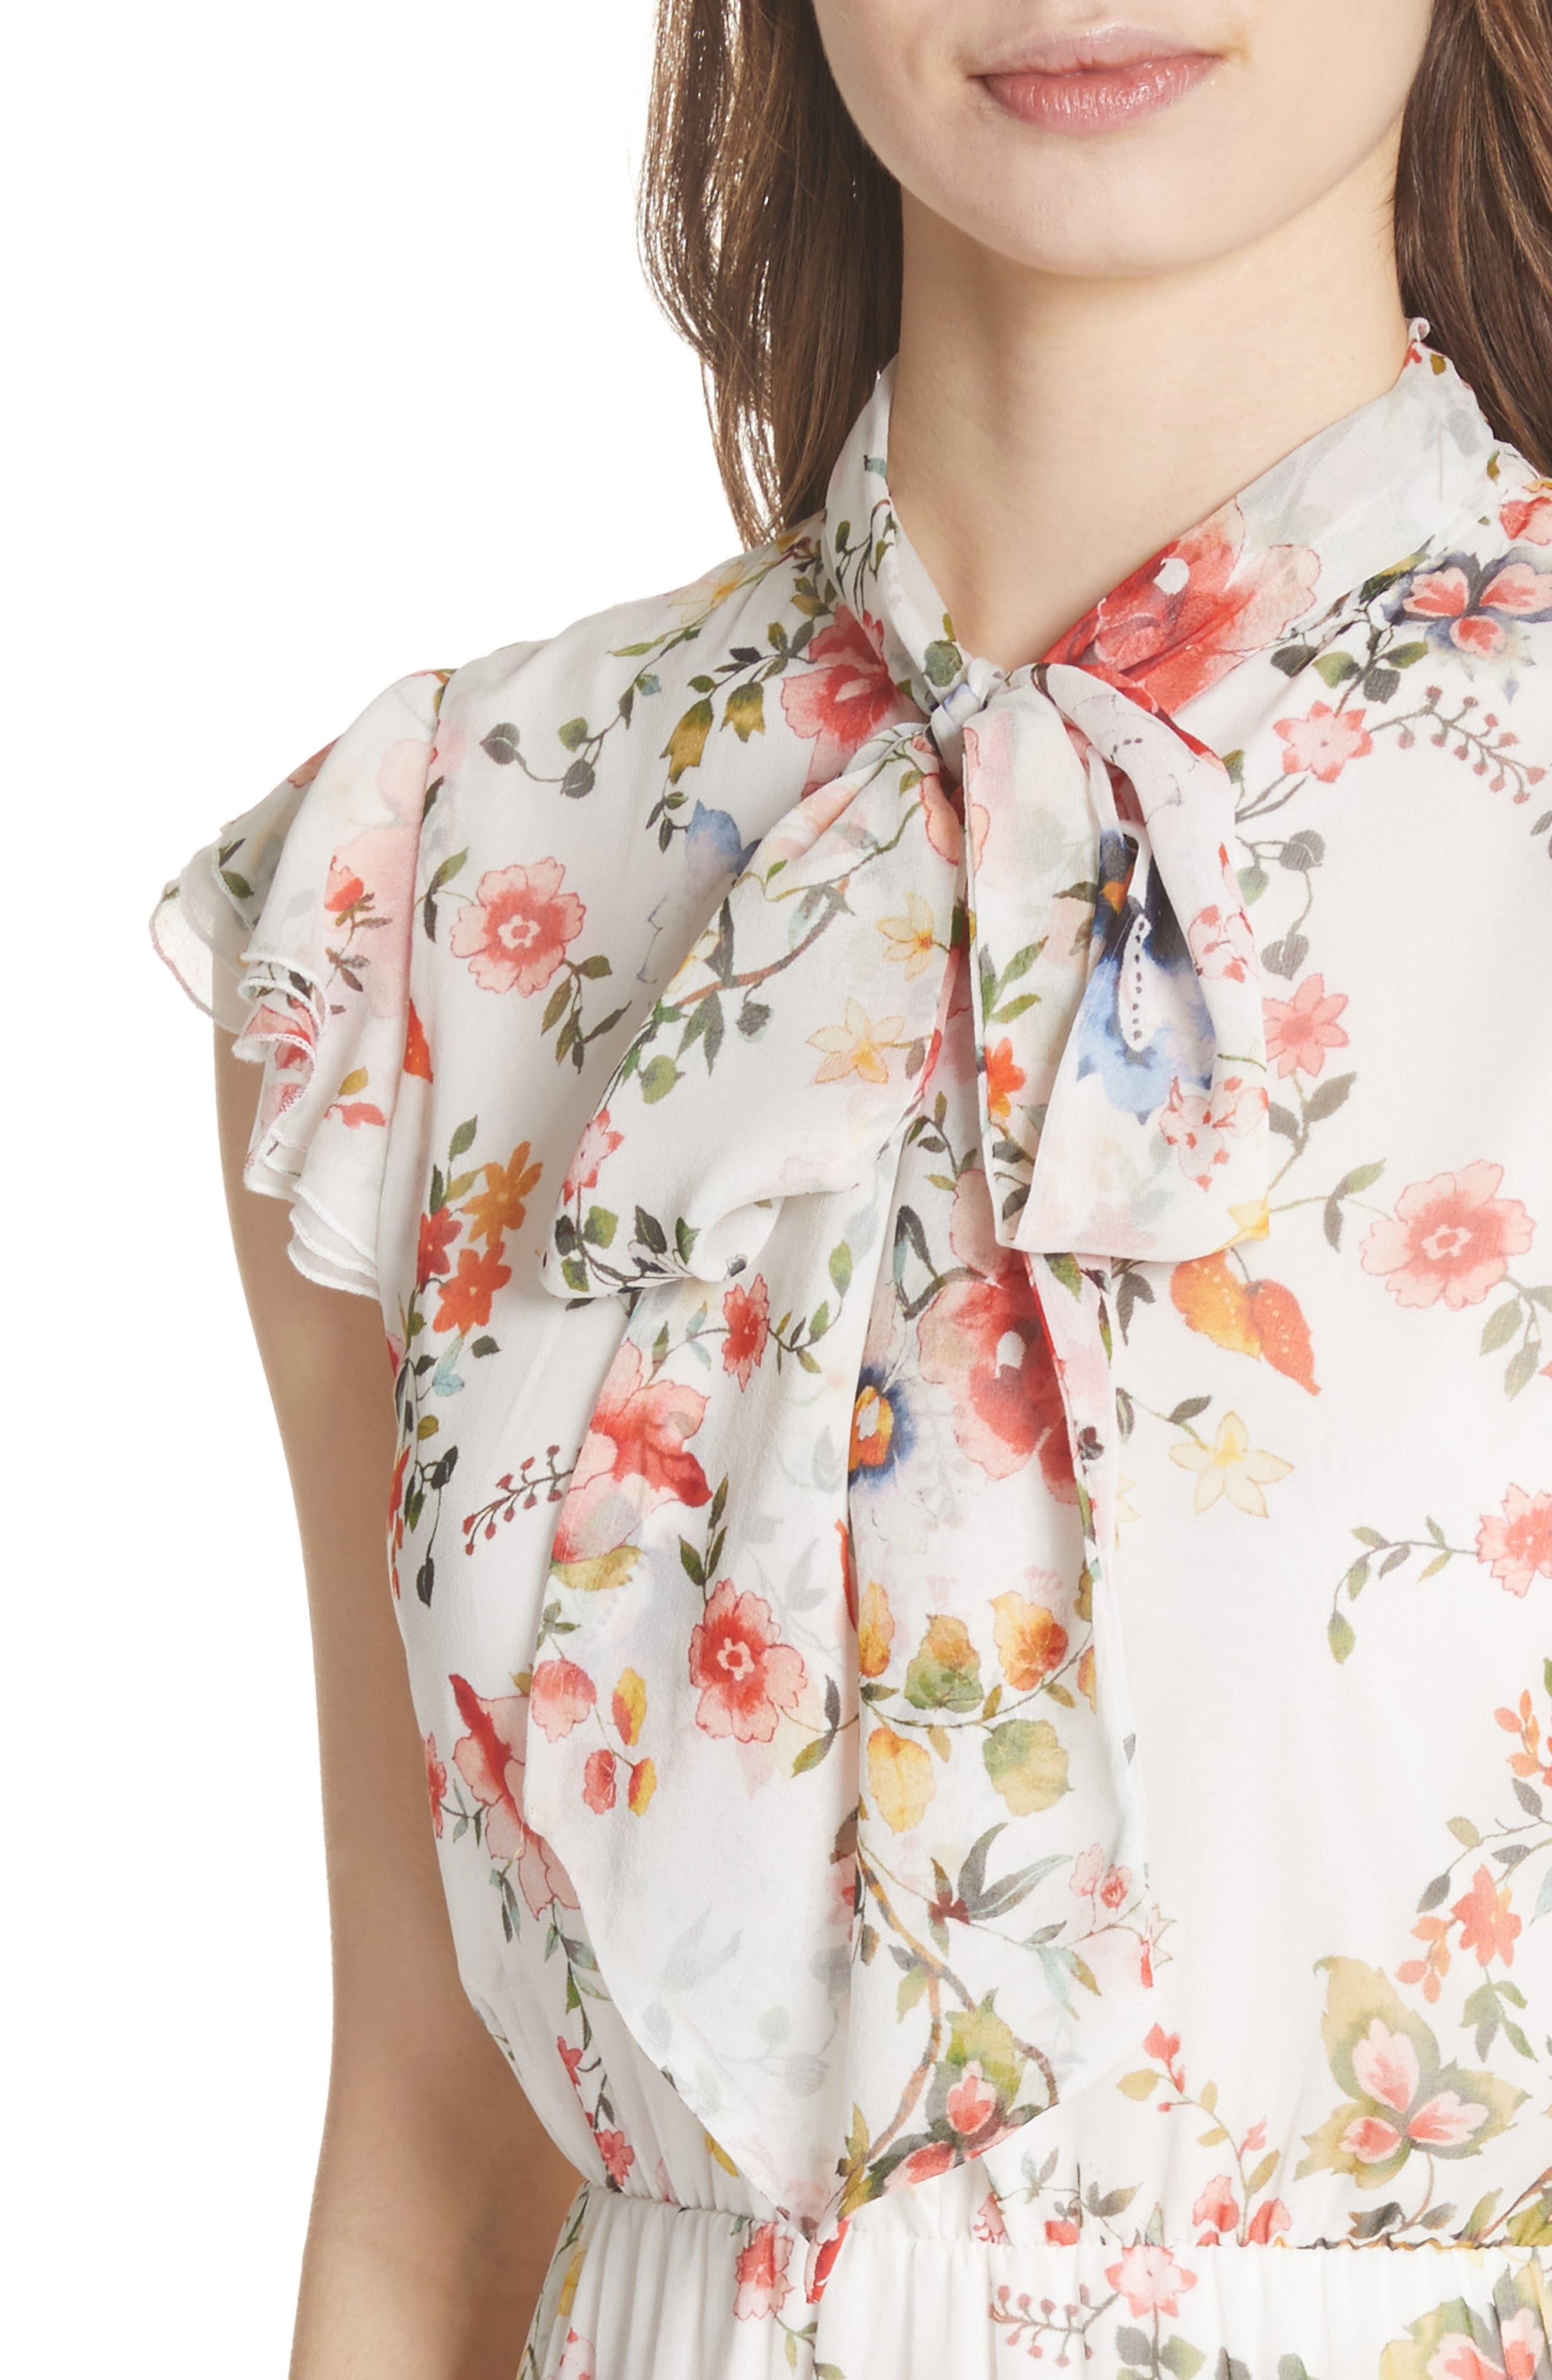 Lessie Ruffled Floral Silk Dress,                             Alternate thumbnail 4, color,                             Floral Soiree-Soft White